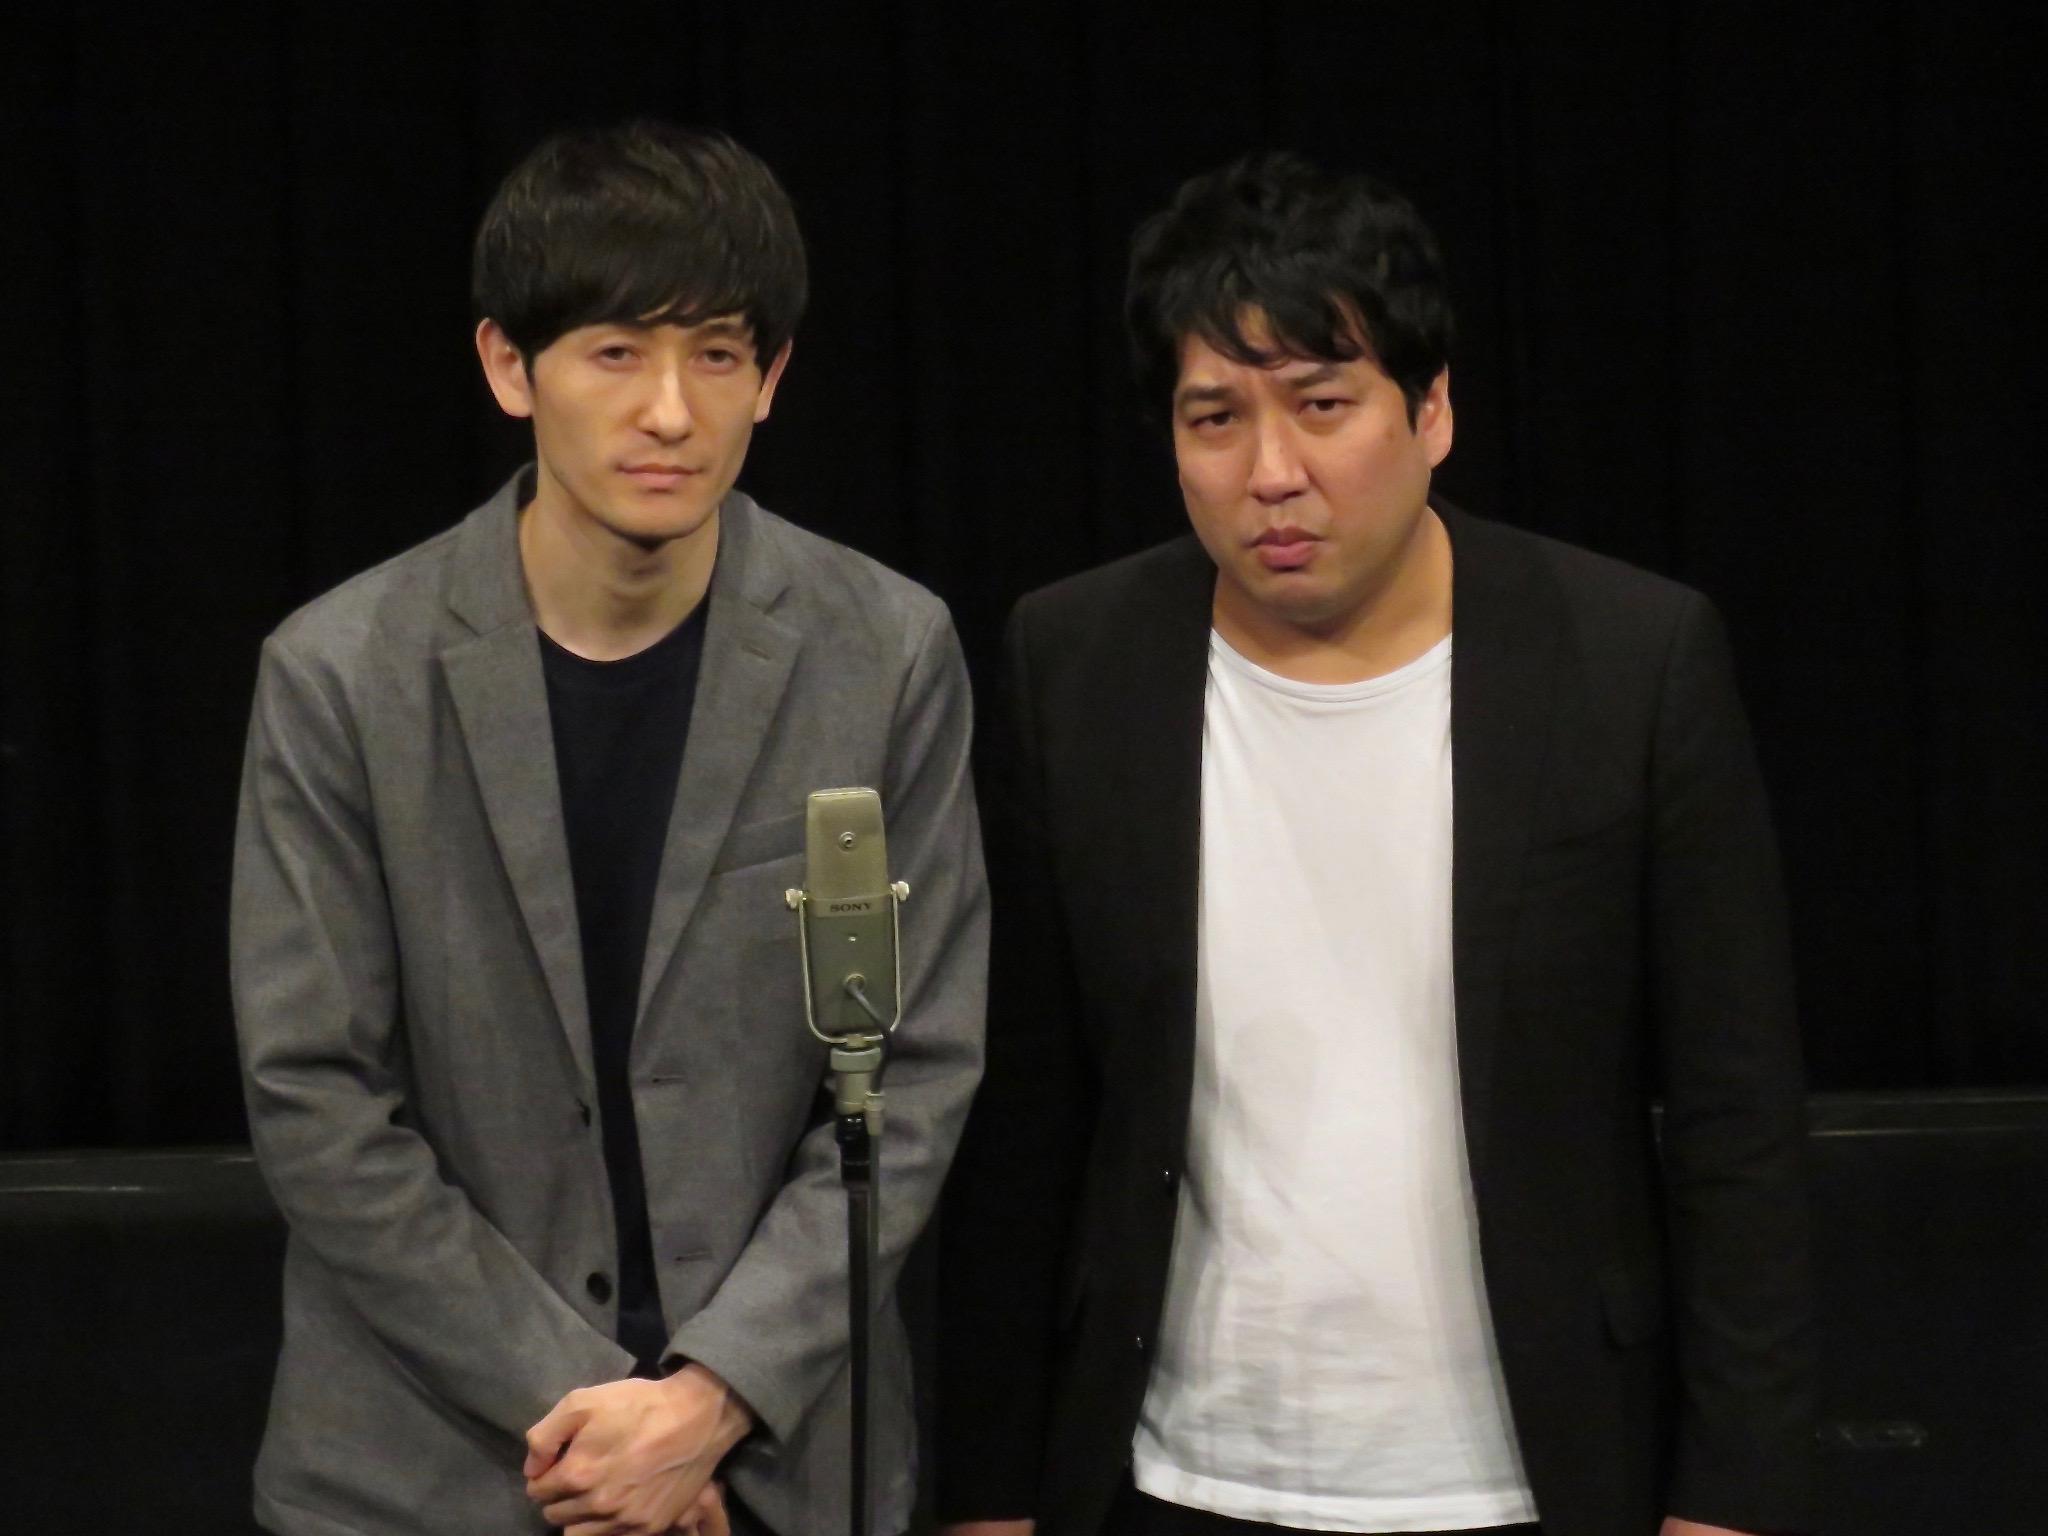 http://news.yoshimoto.co.jp/20181227123429-d412c0a33904c81ac64aba52021189999763c2d0.jpeg